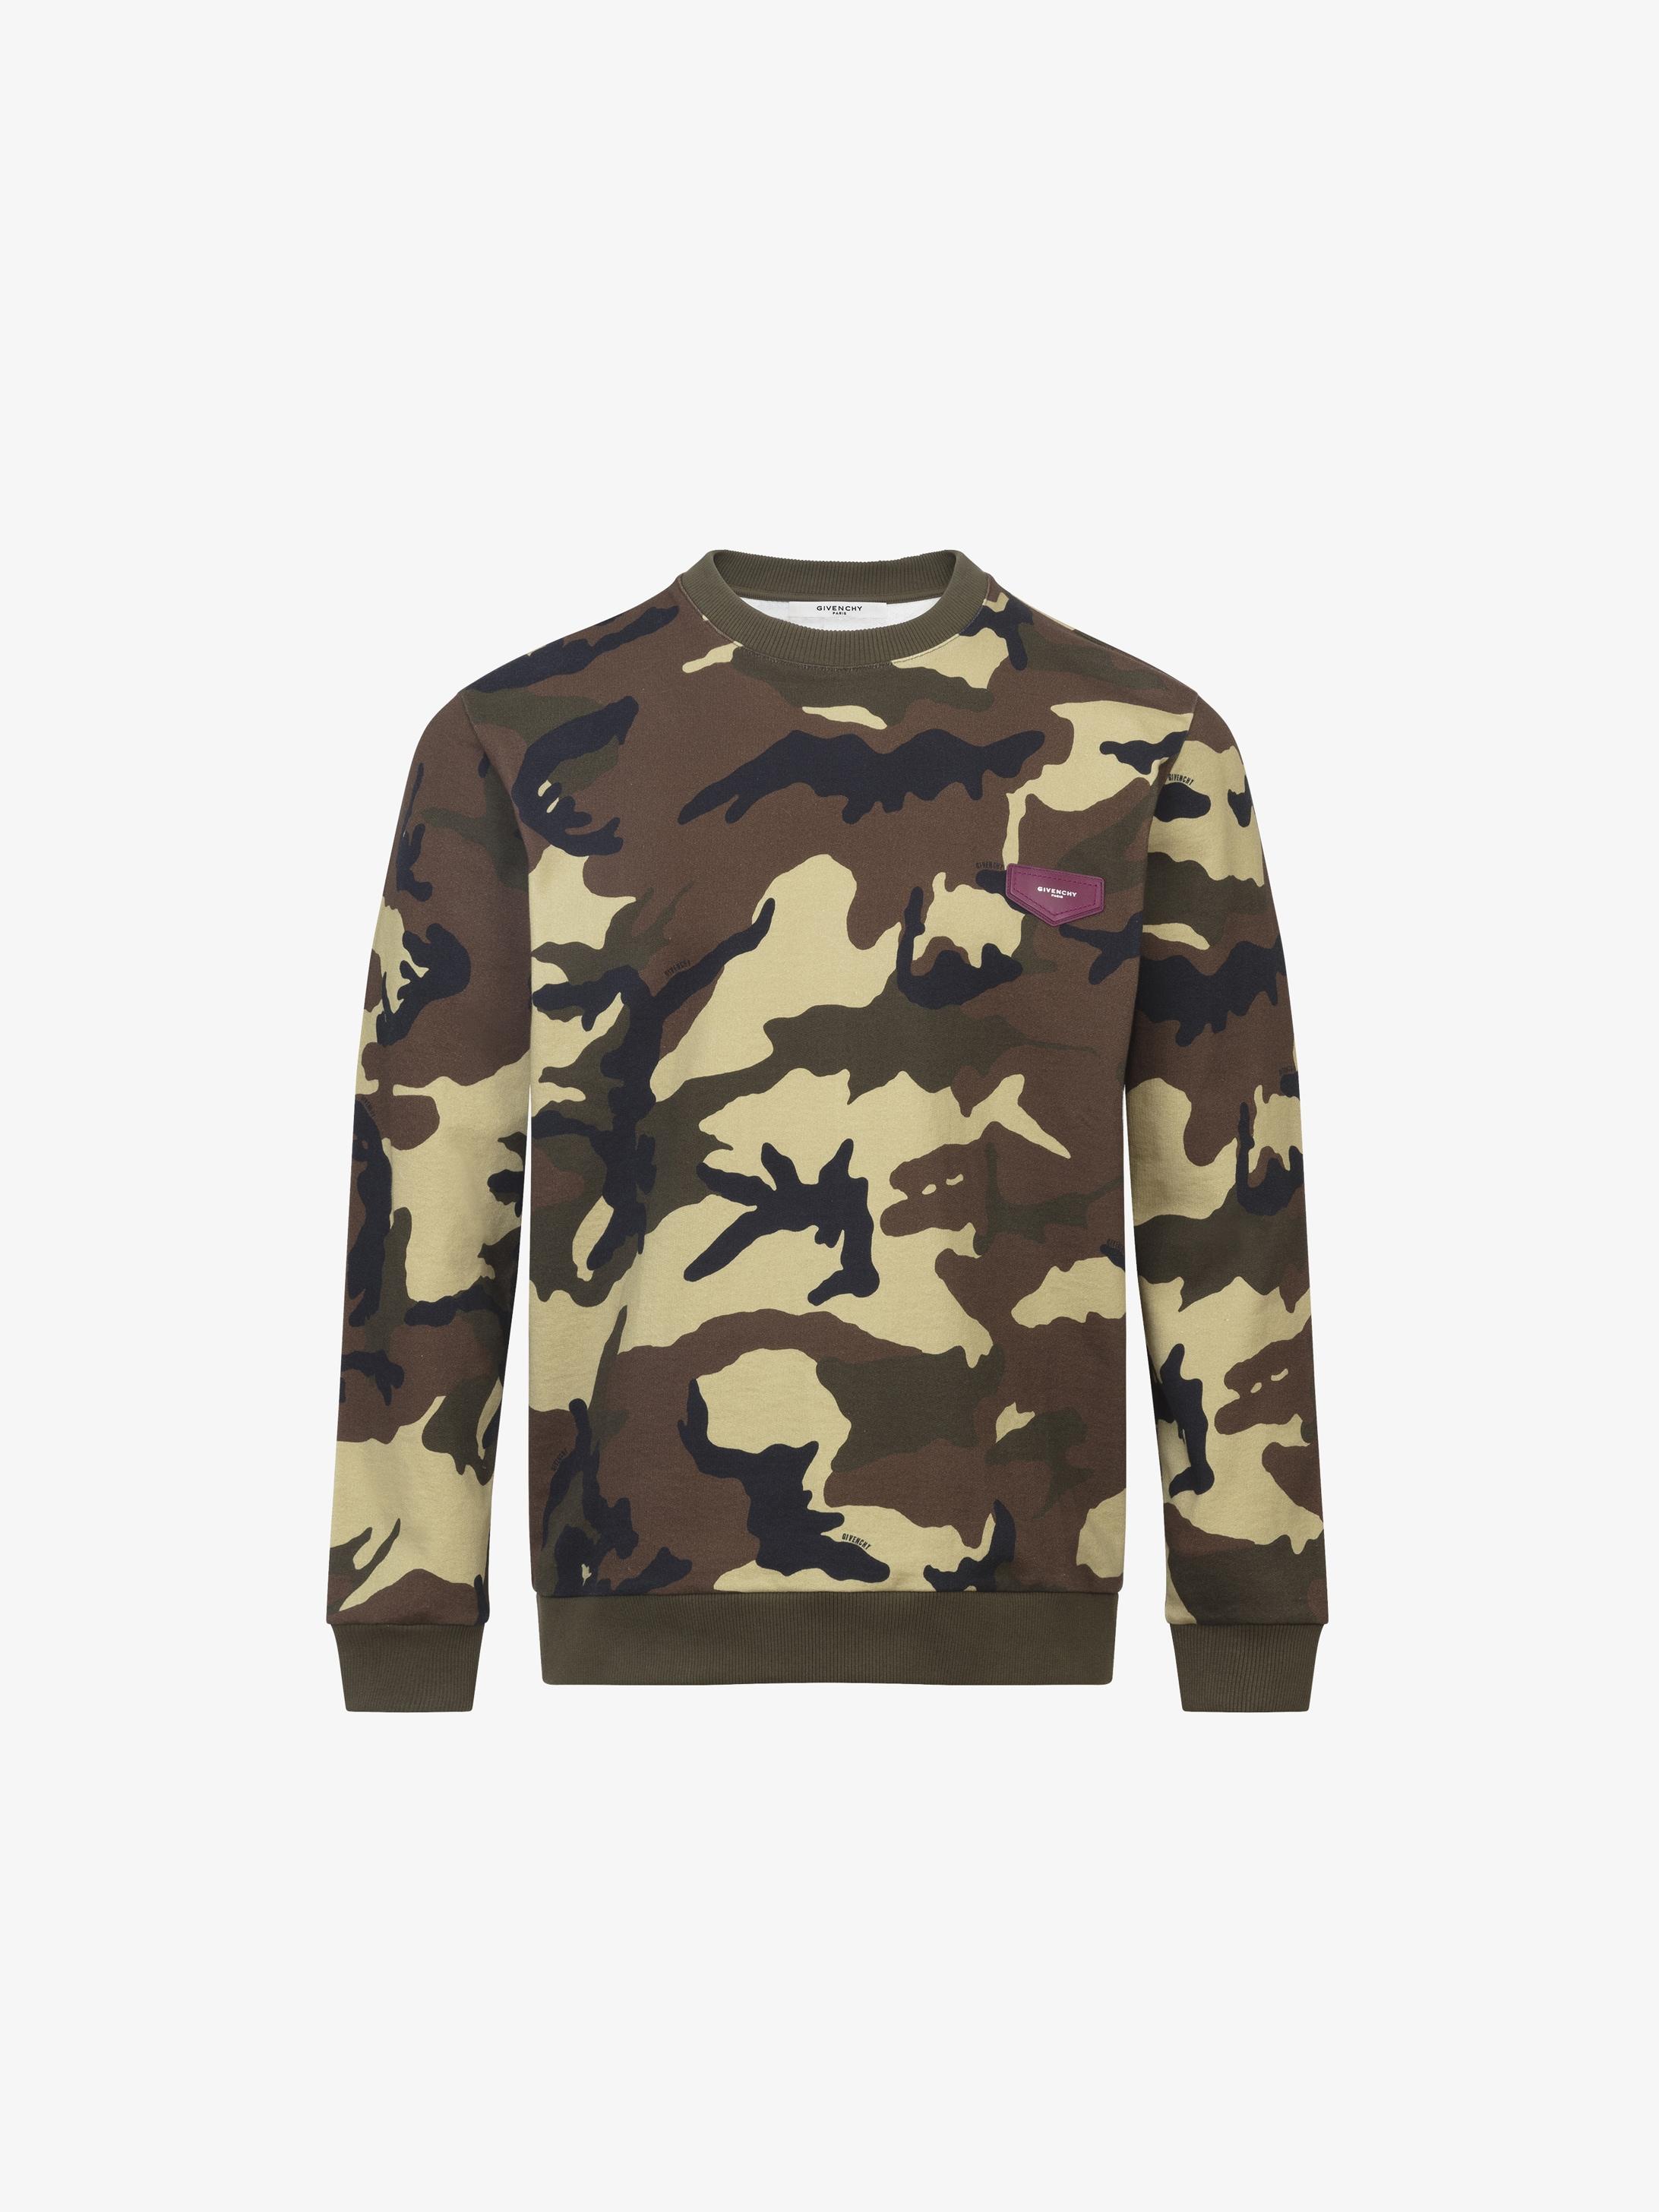 Camo printed sweatshirt in felpa